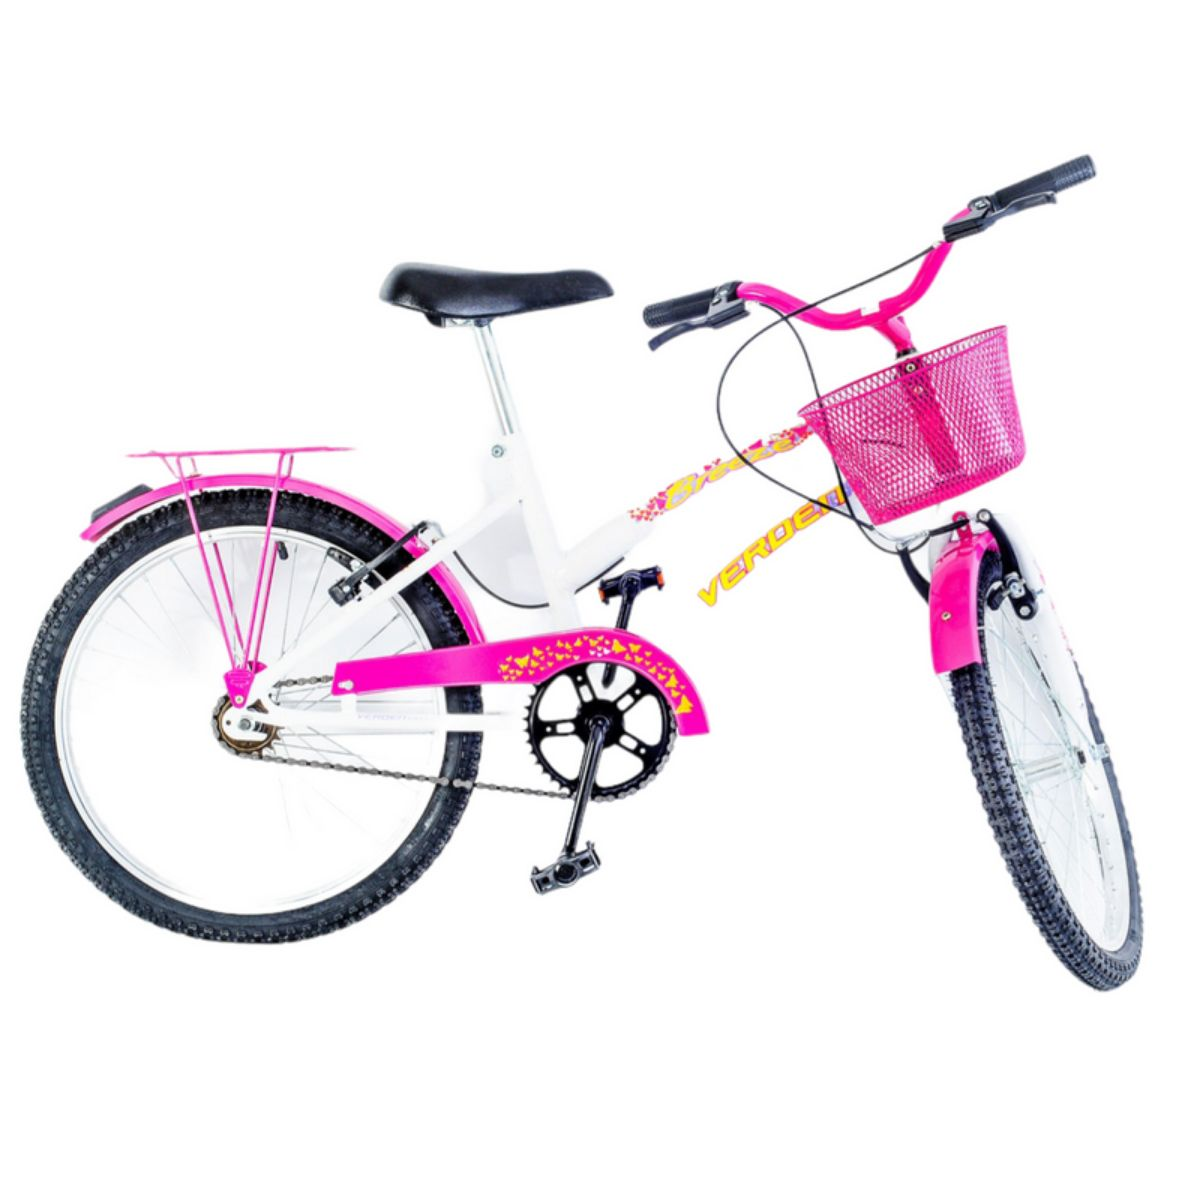 Bicicleta Juvenil Breeze Rosa Aro 20